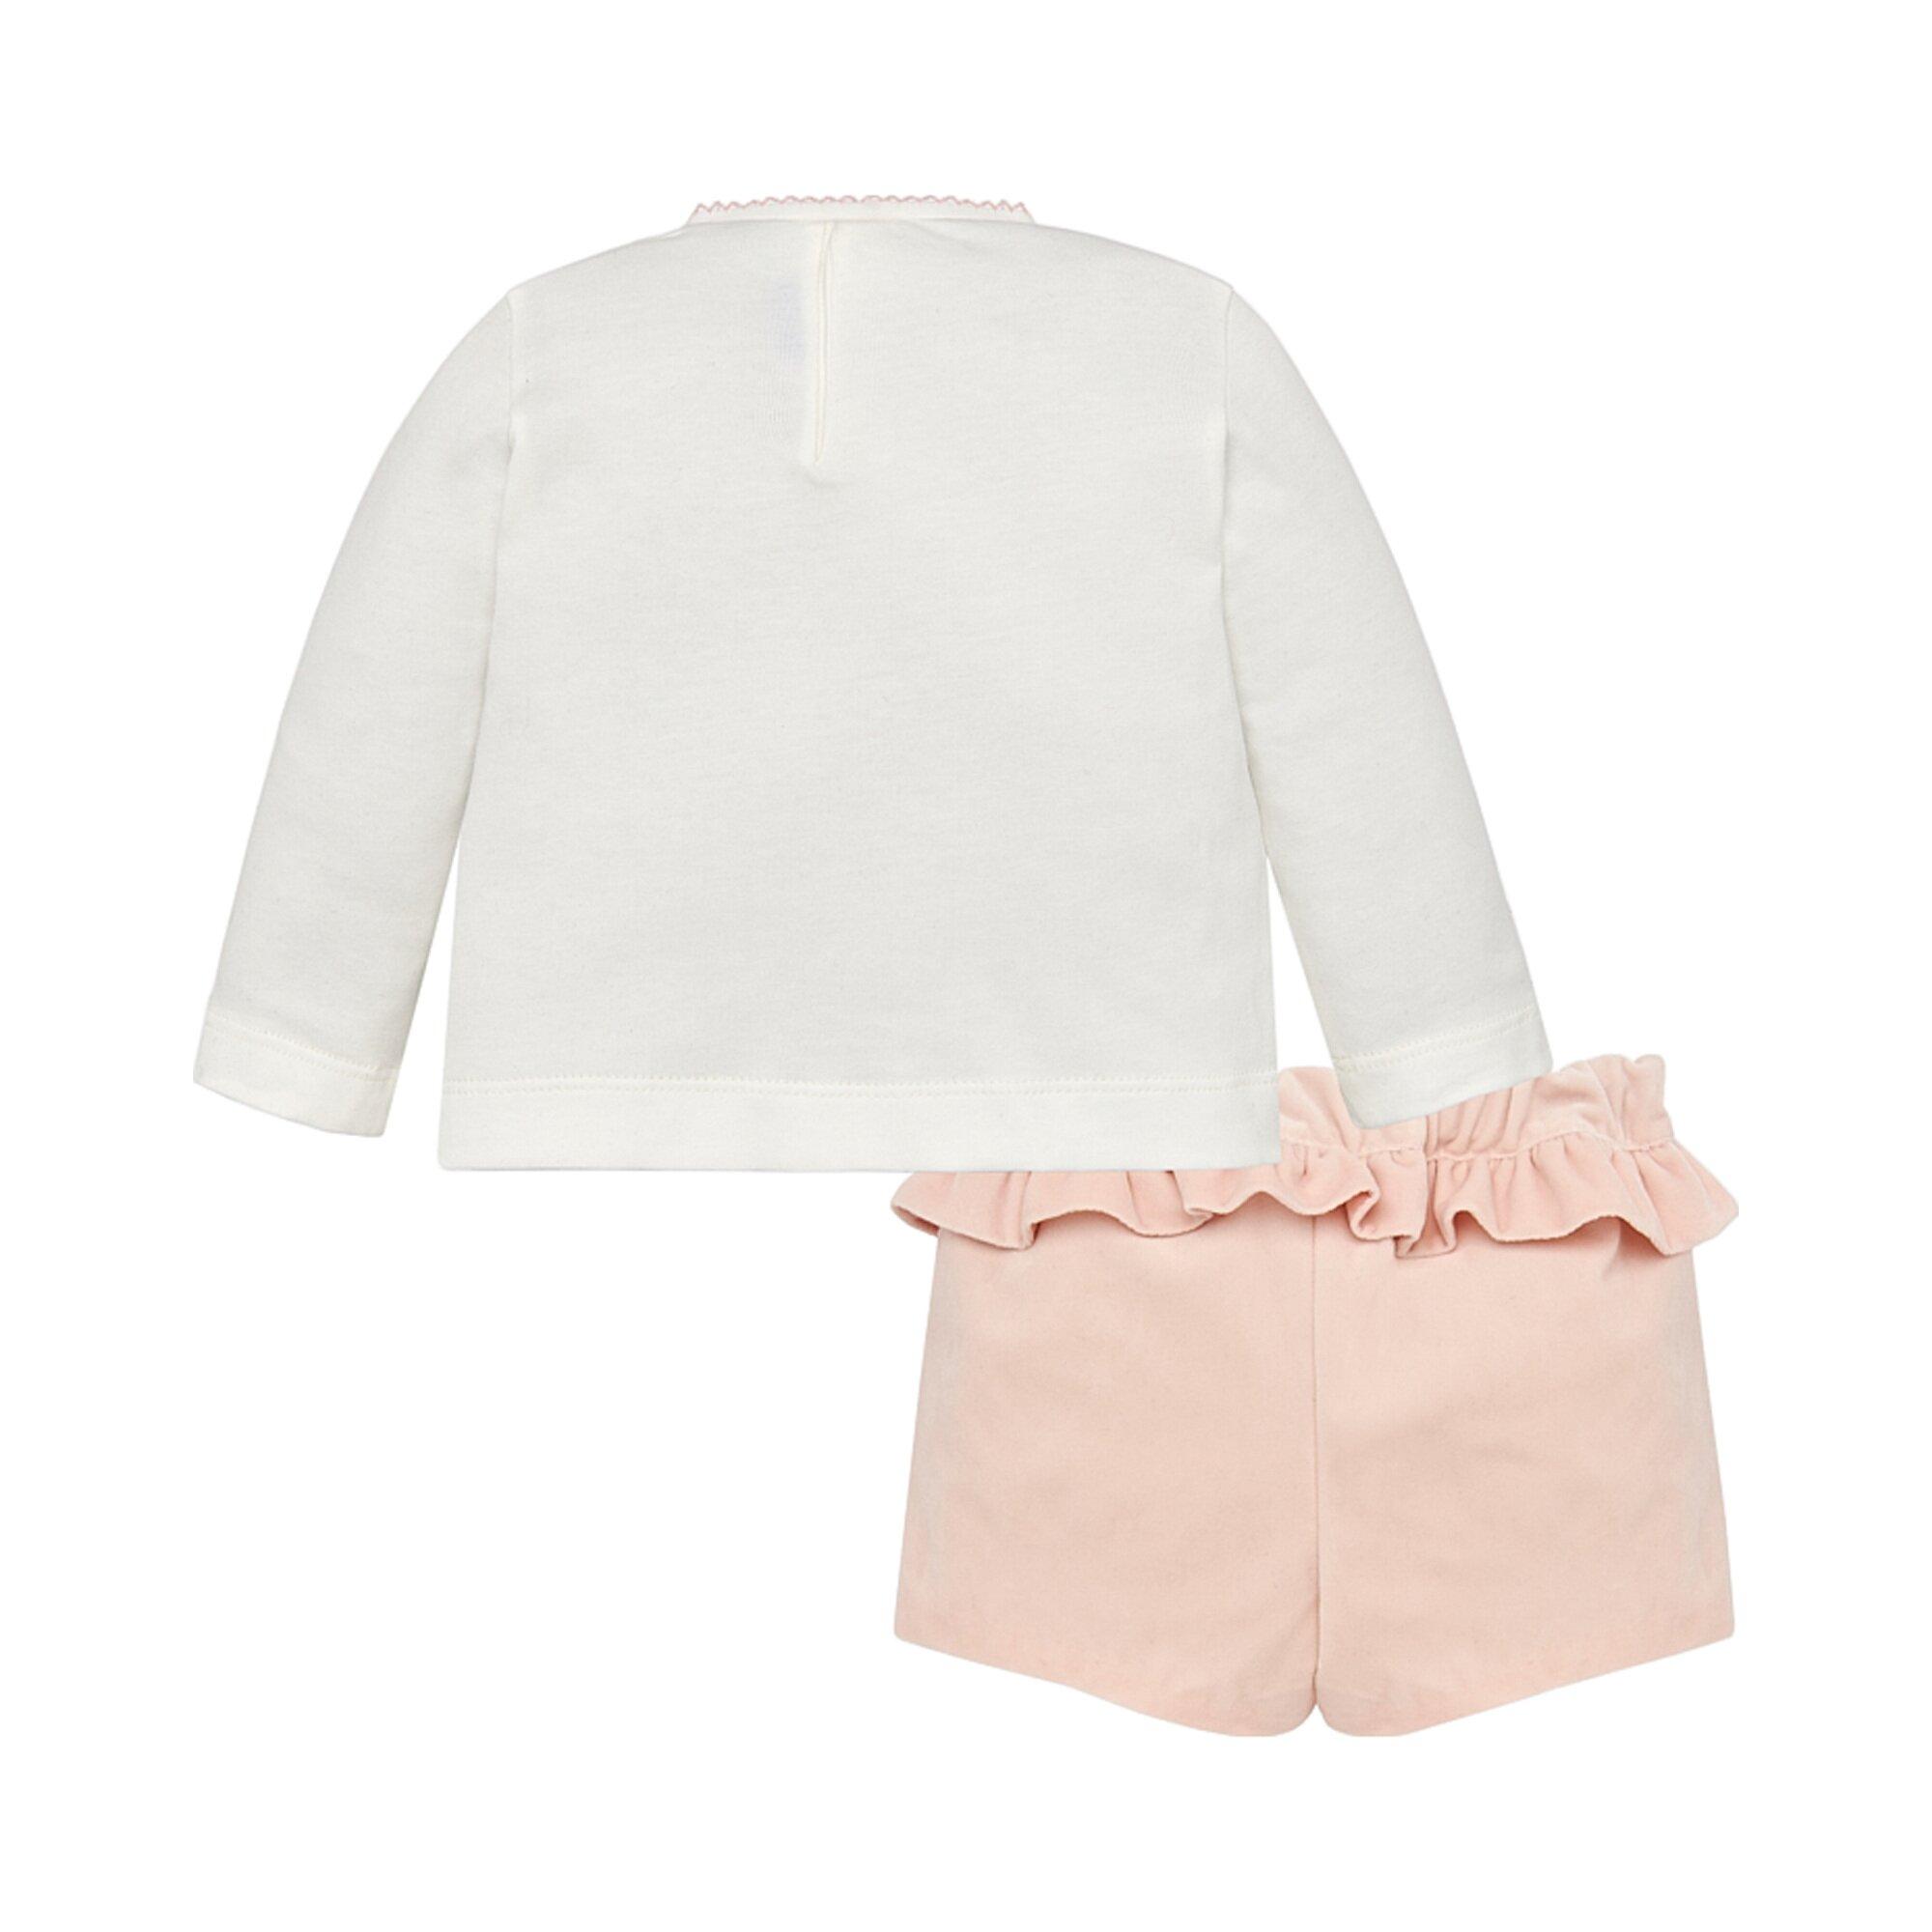 mayoral-2-tlg-set-shirt-langarm-und-samt-shorts-haus